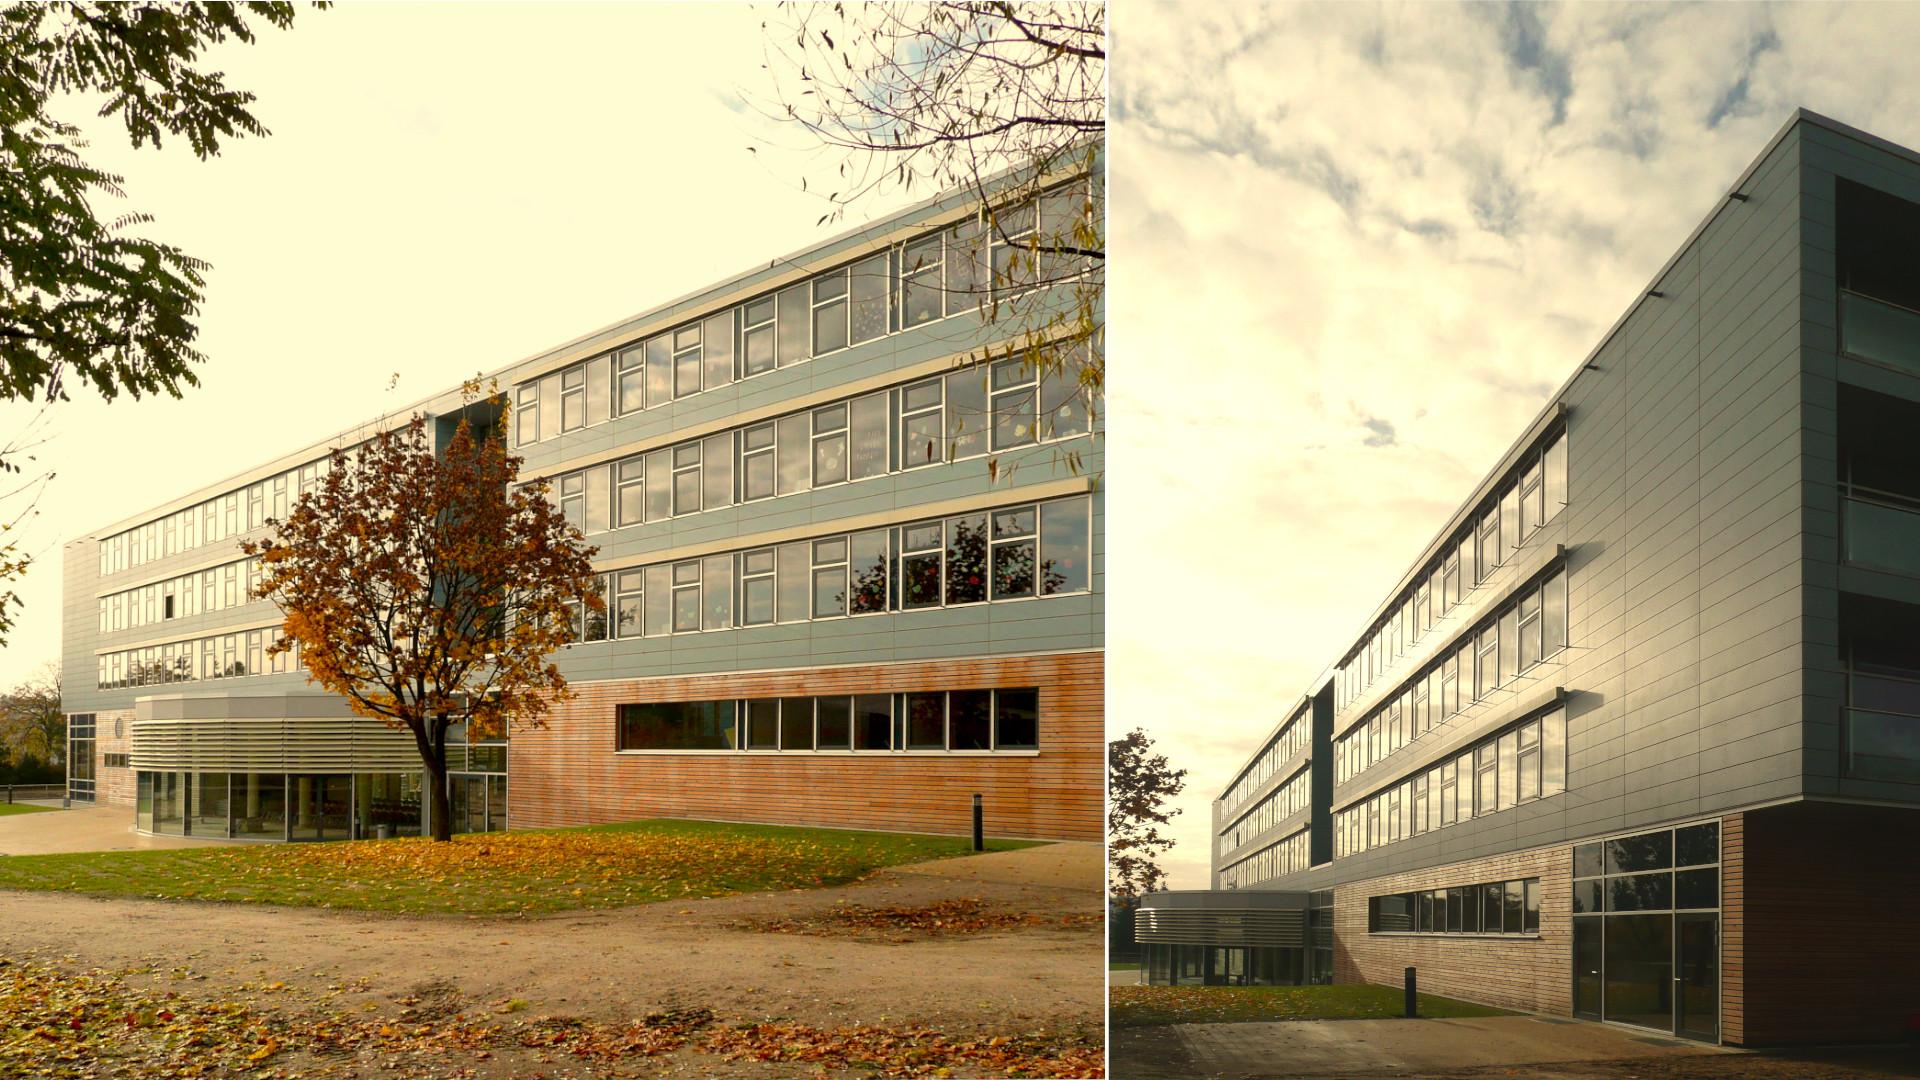 02-grundschule-bernau-blumenhag-bm